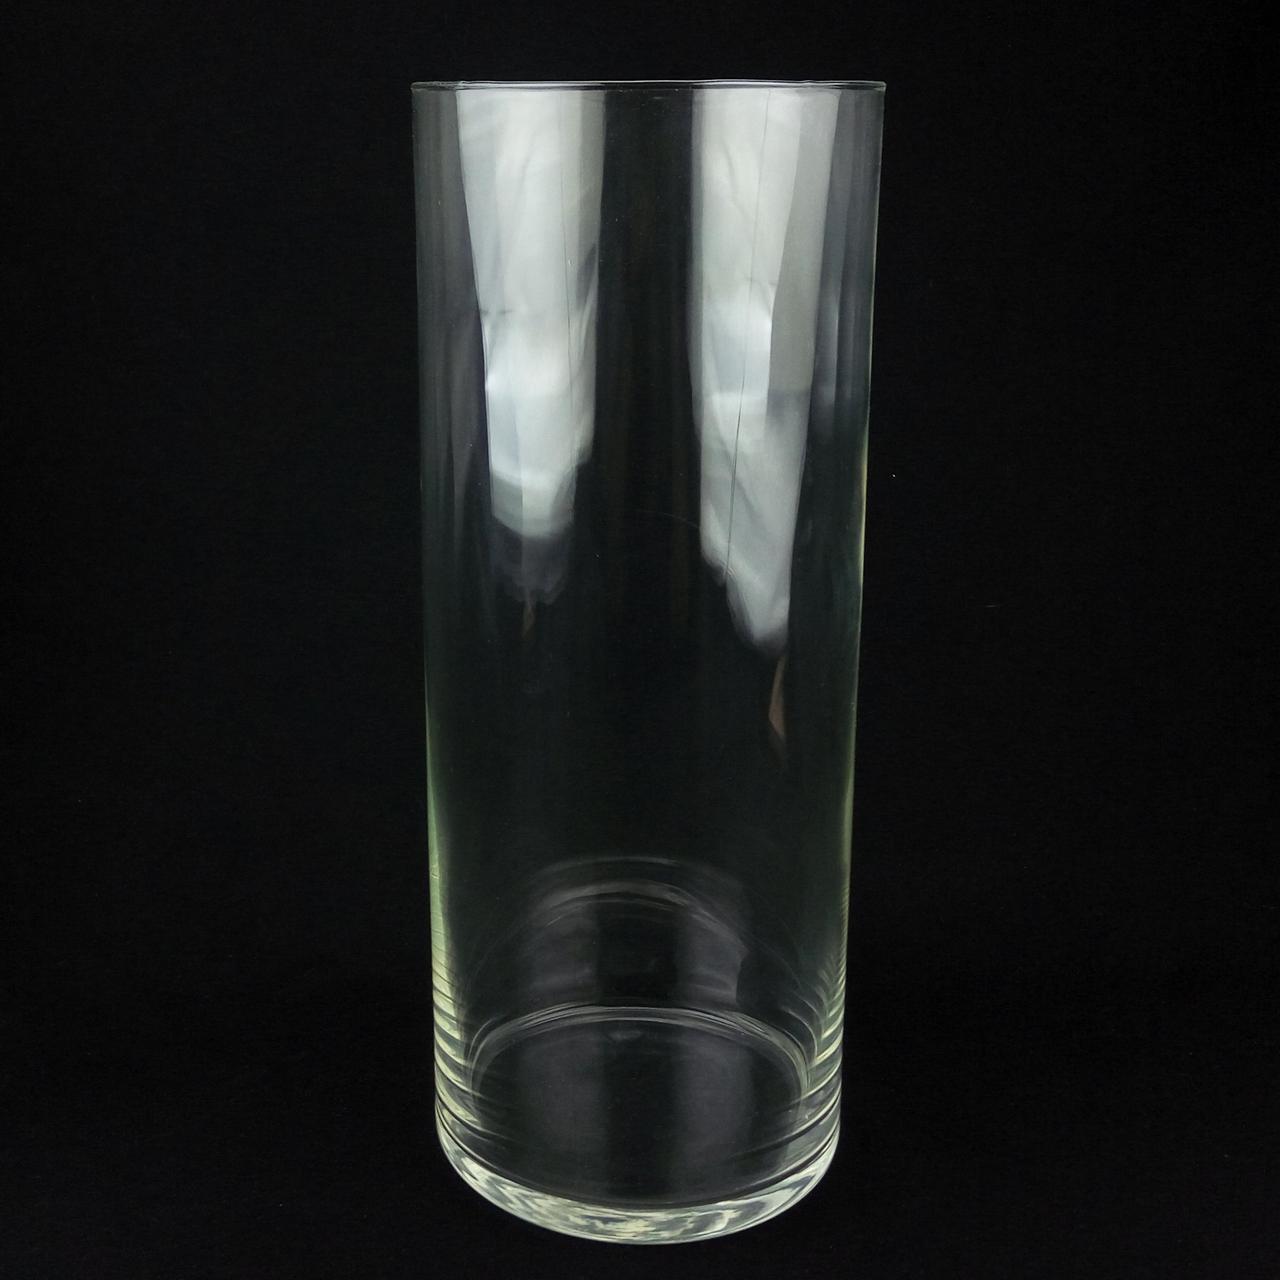 Подсвечник h 38 см, Ø 16 см, колба